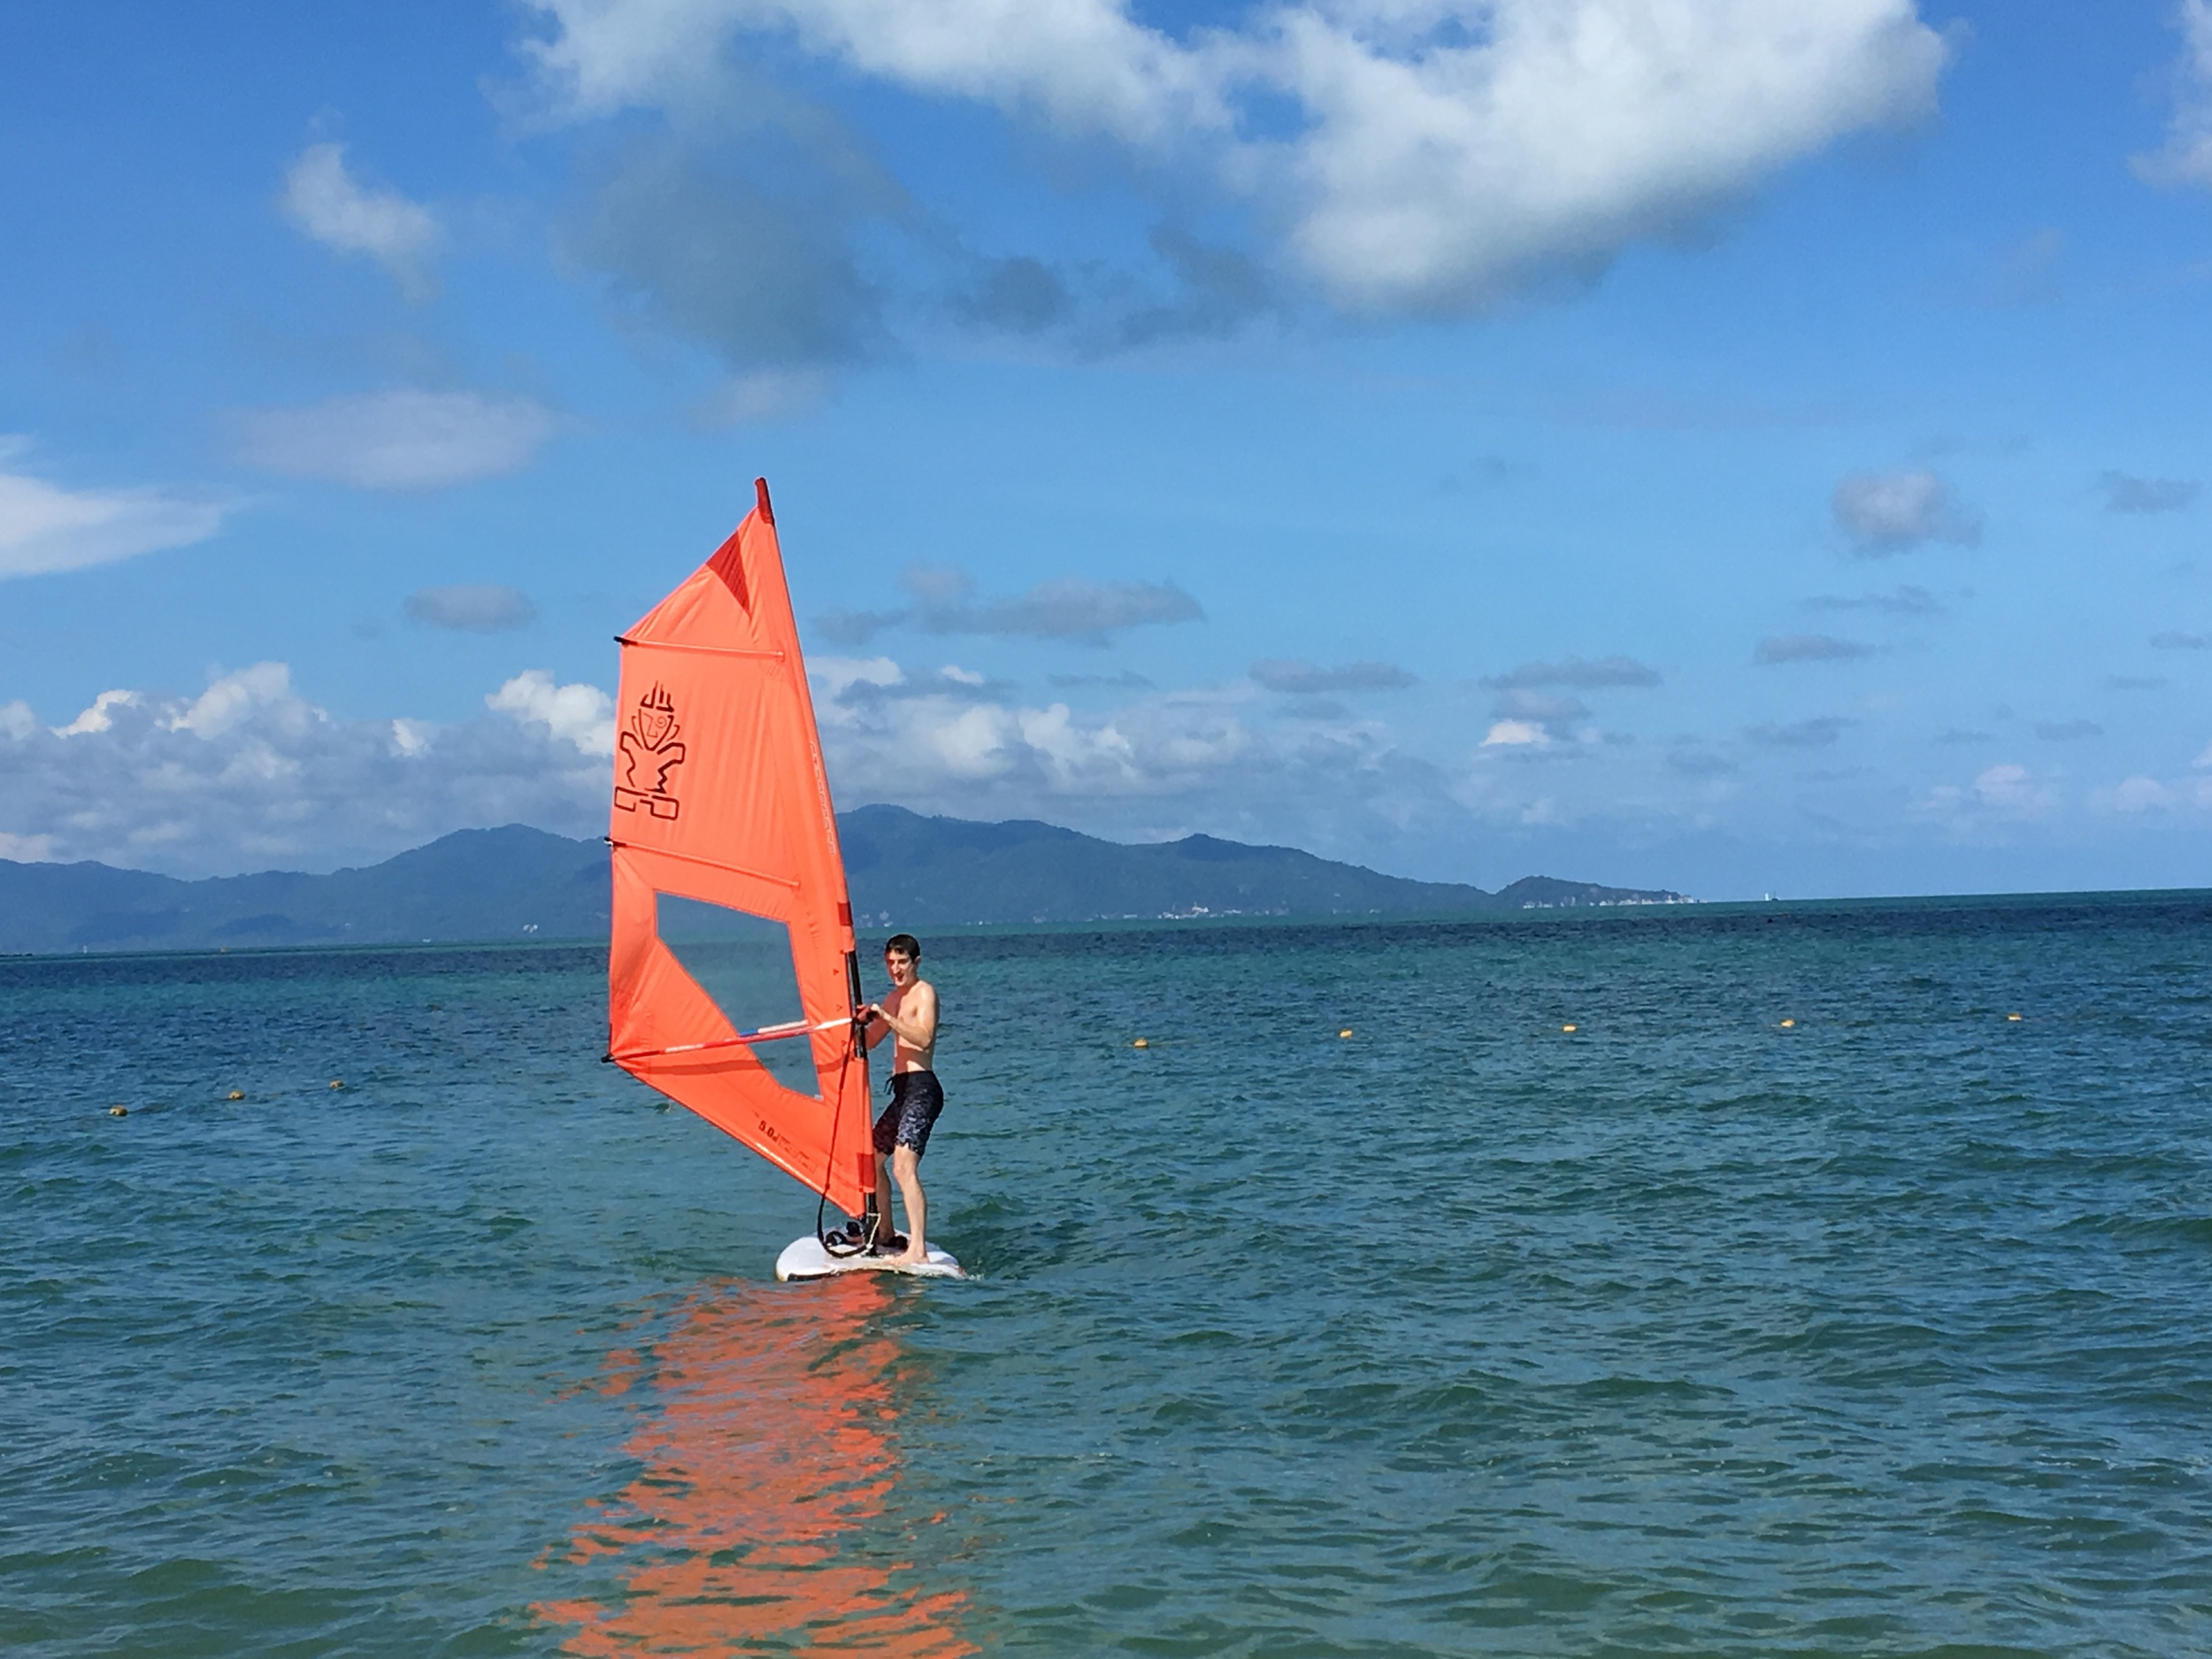 Scott learns to windsurf